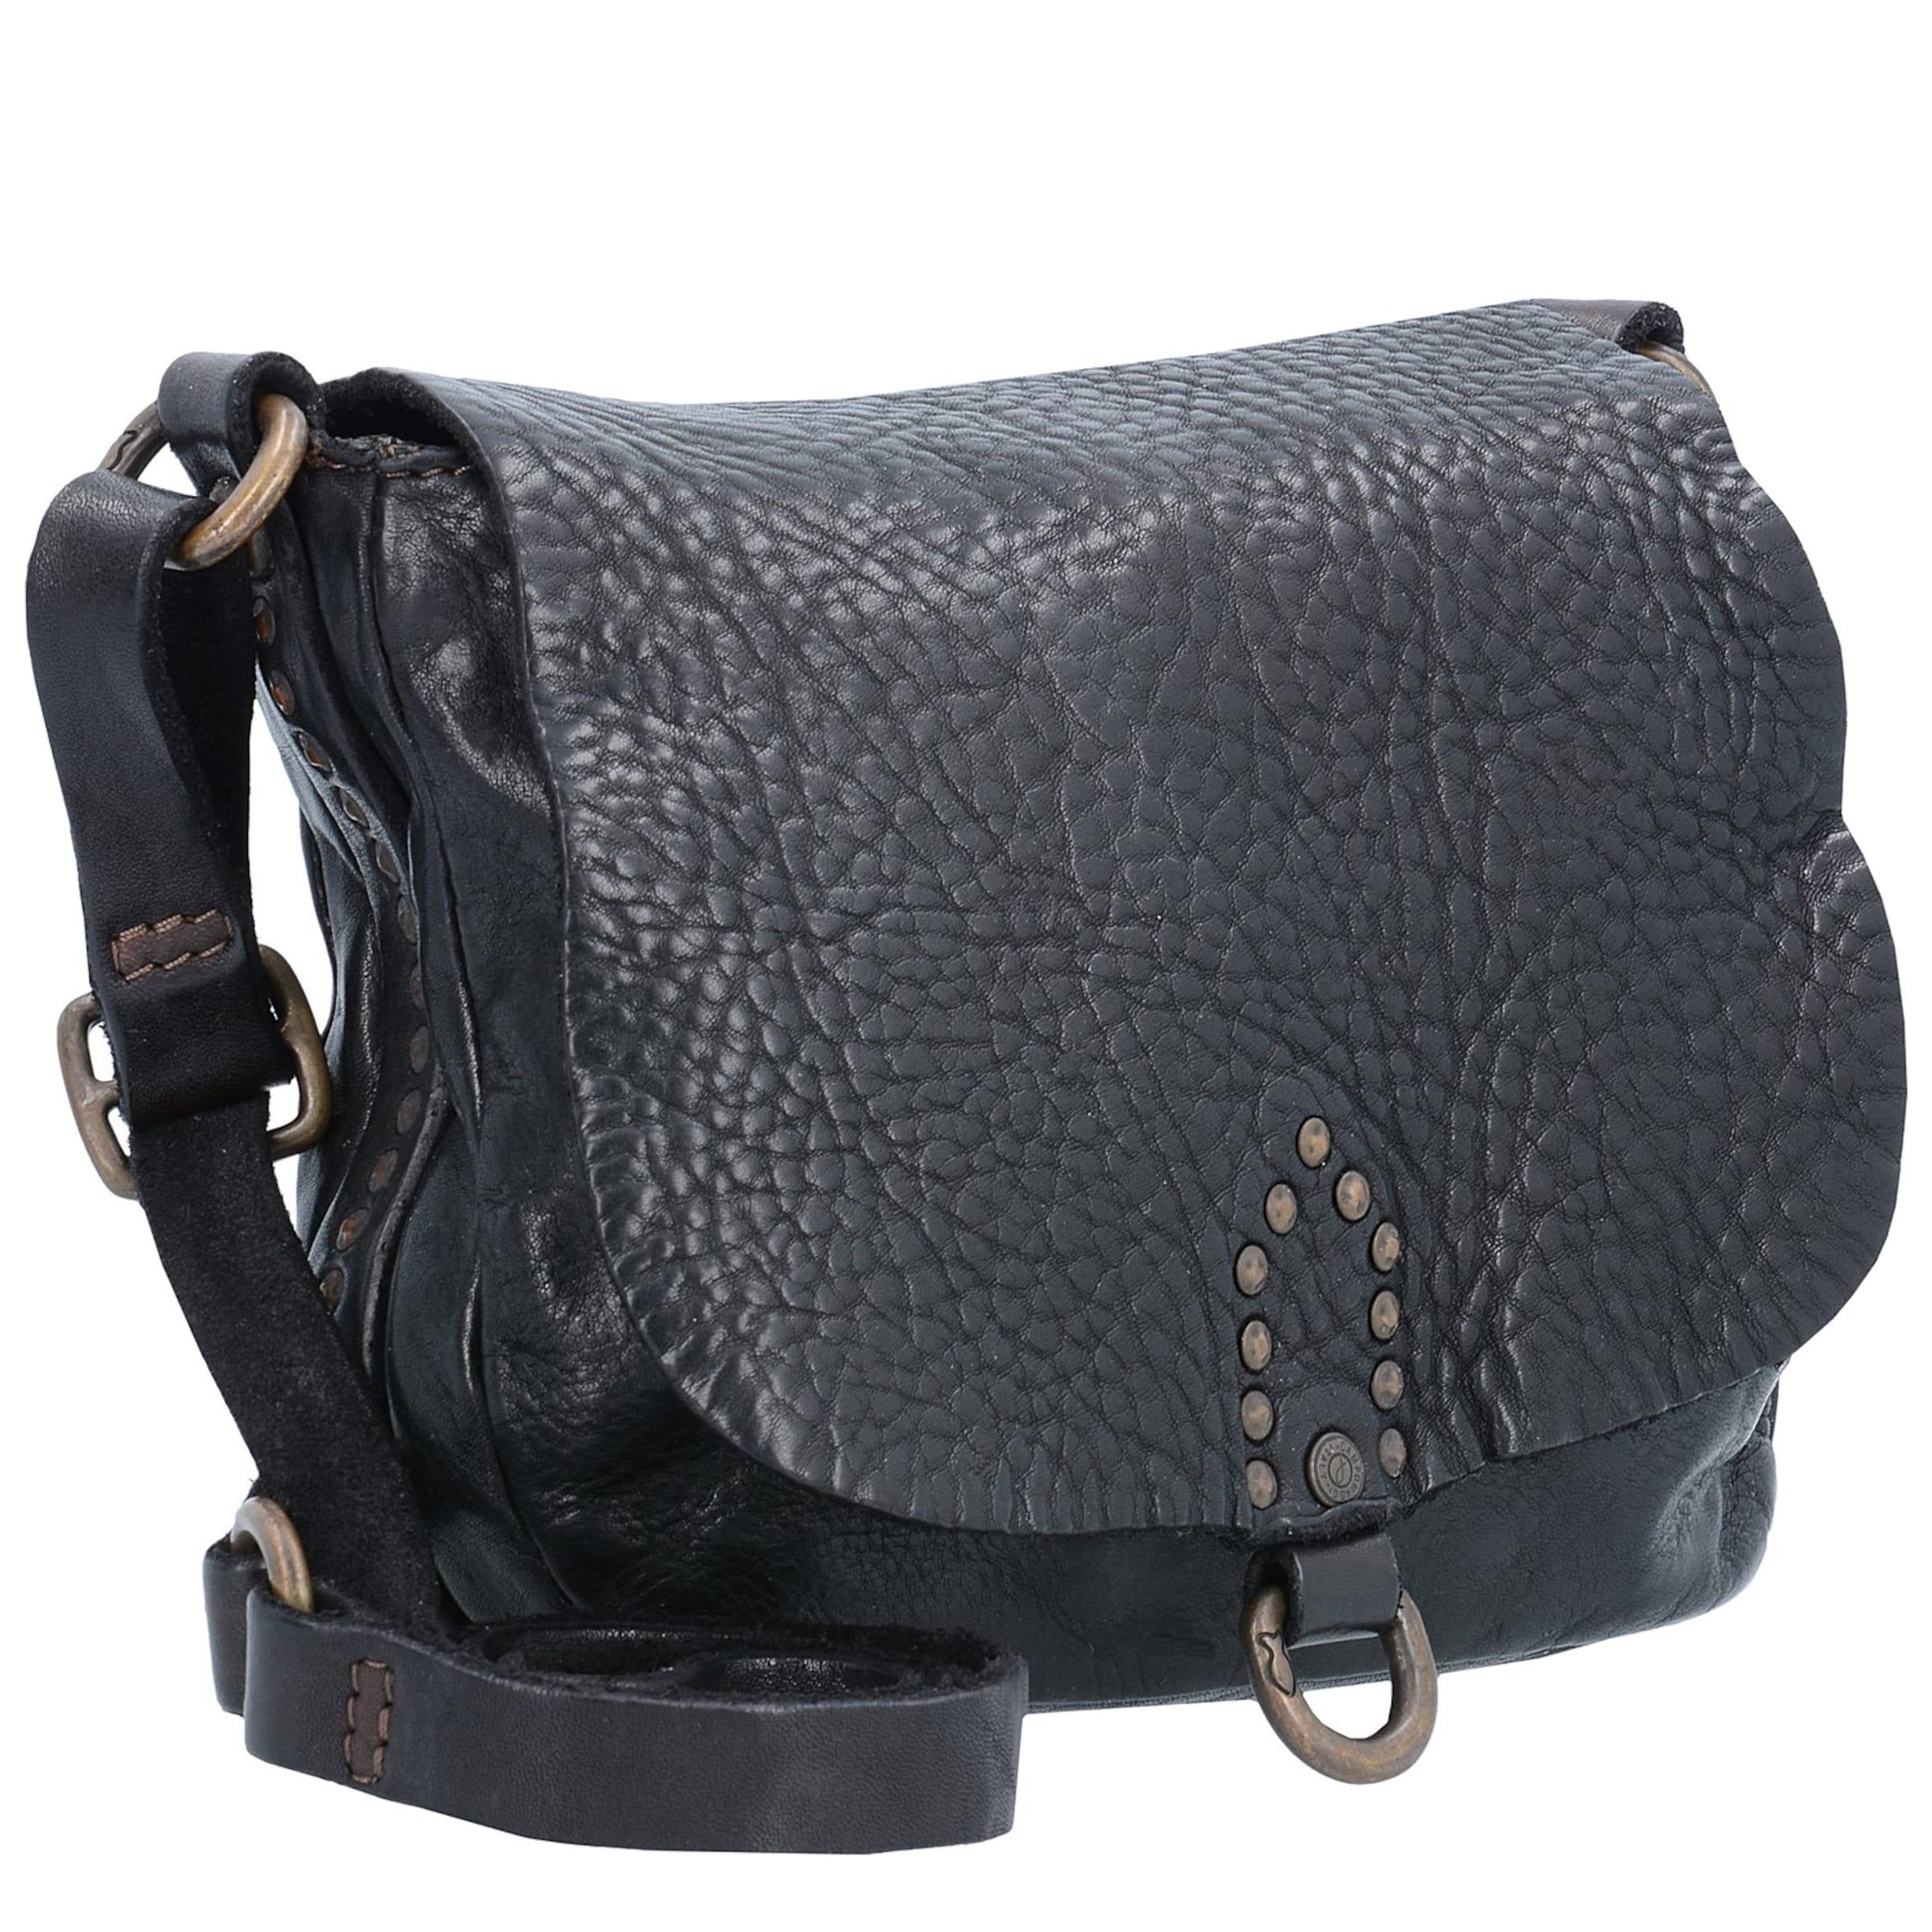 Campomaggi Cacciatorina Mini Bag Umhängetasche Leder 18 cm Billig Verkauf Wirklich pbvDT0n